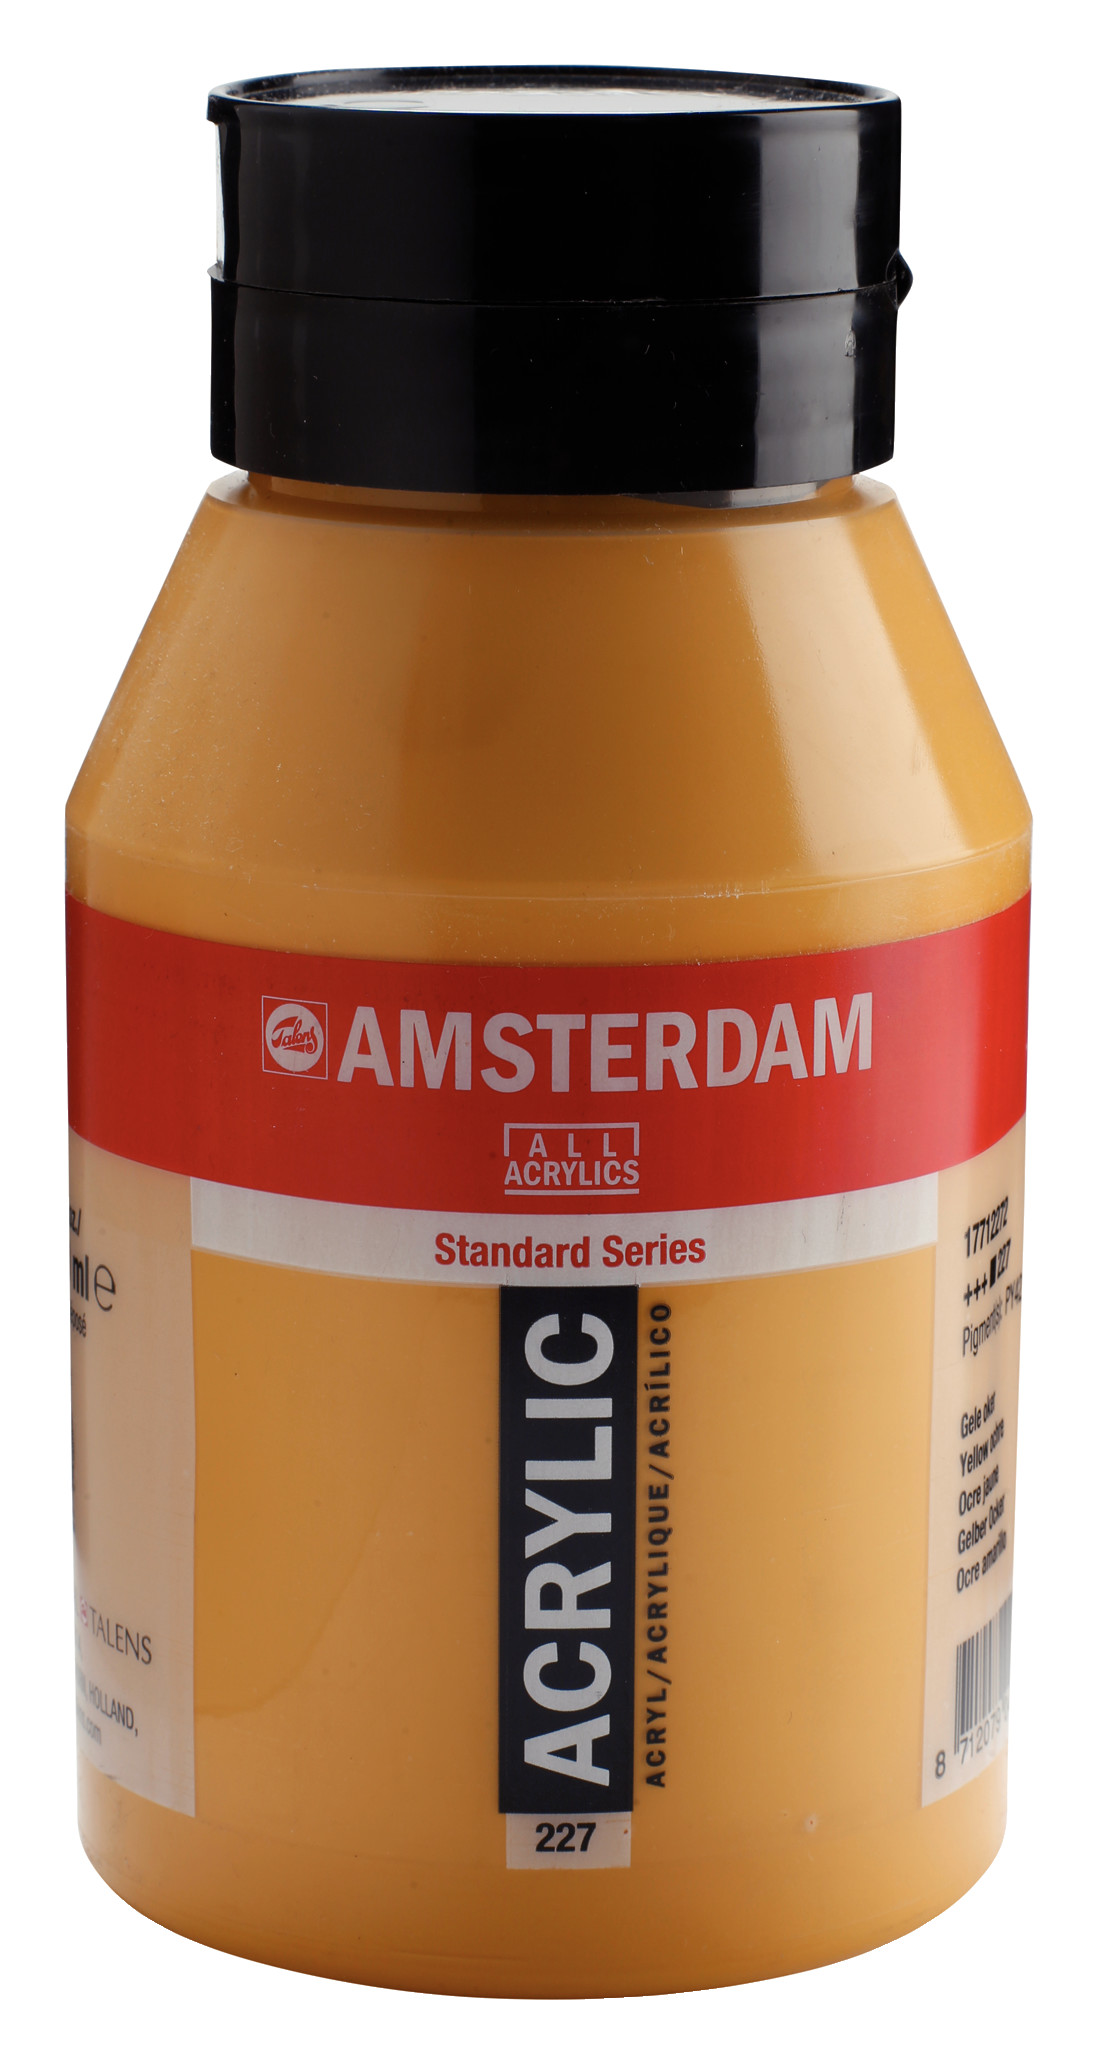 Amsterdam Standard Series Acrylic Jar 1000 ml Yellow ochre 227